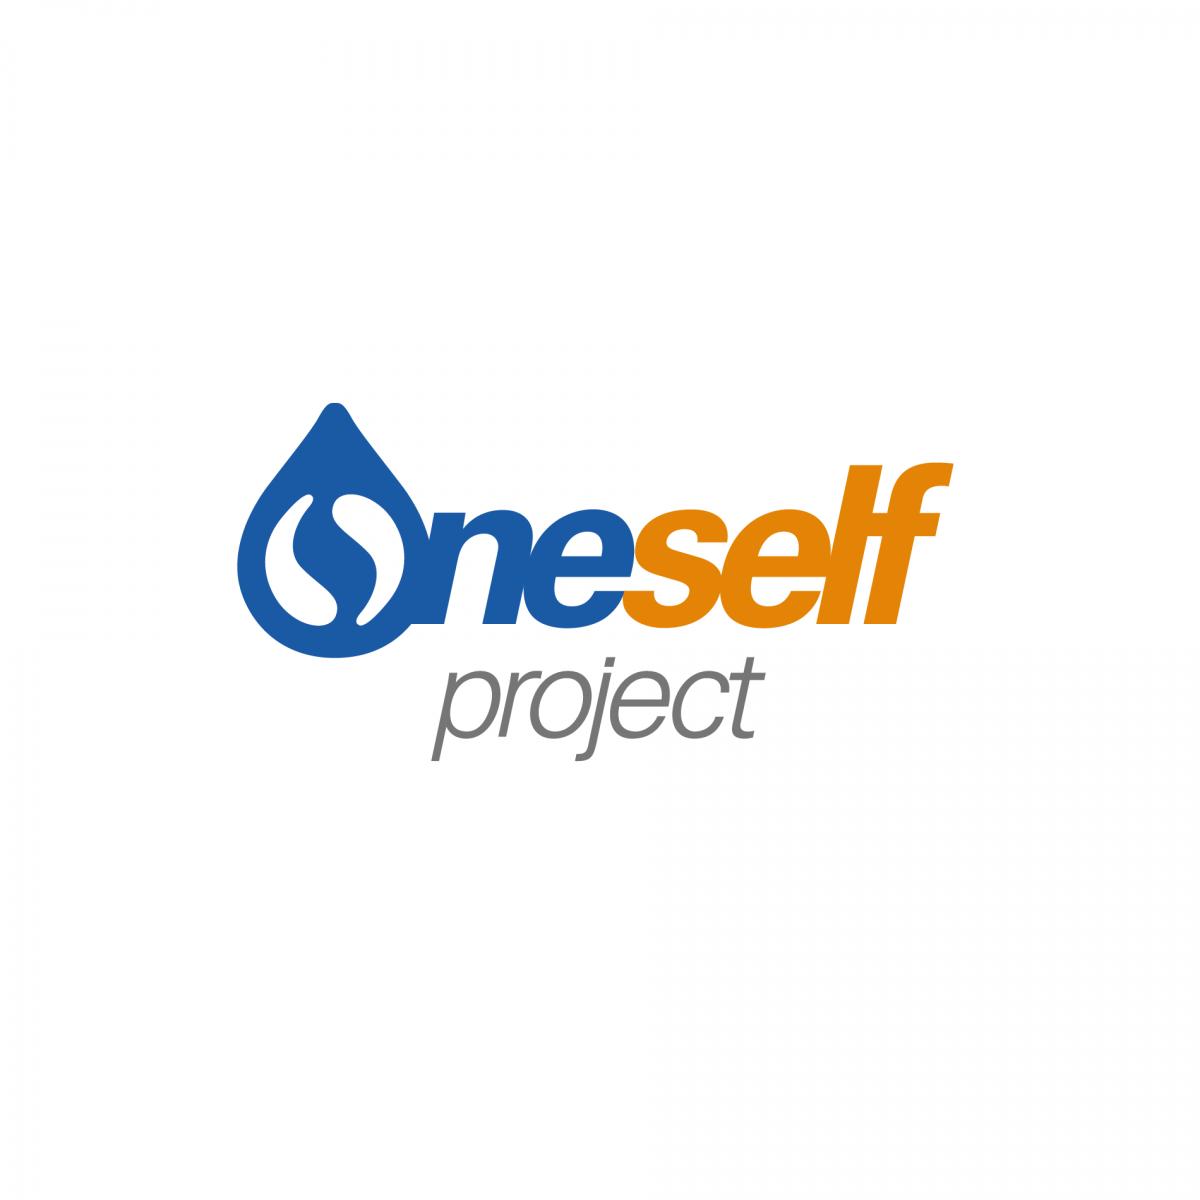 Oneself Project ワンセルフ・プロジェクト - 横浜建物管理協同組合・神奈川県中小企業中央会|VI ロゴシンボル|社会福祉・ビル管理メインテナンス団体|神奈川県横浜市